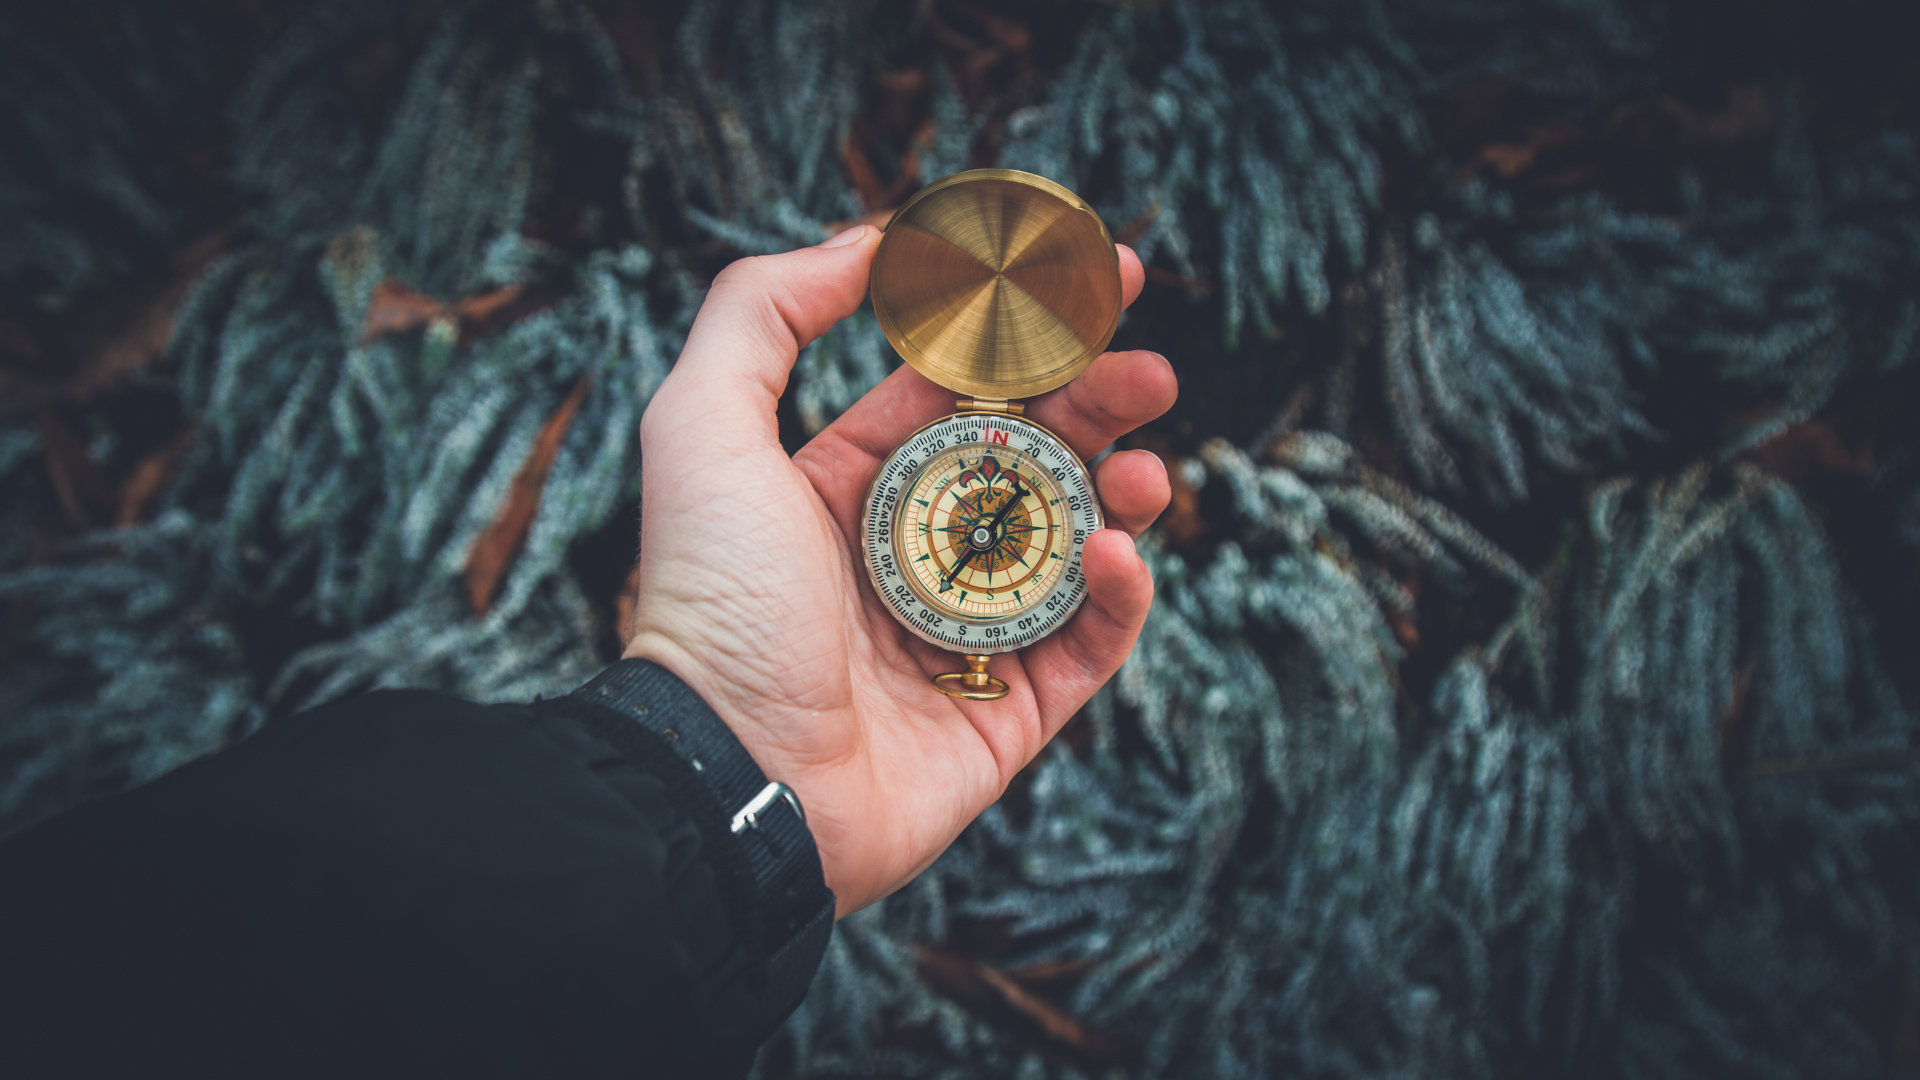 Kompass im Survival Kit